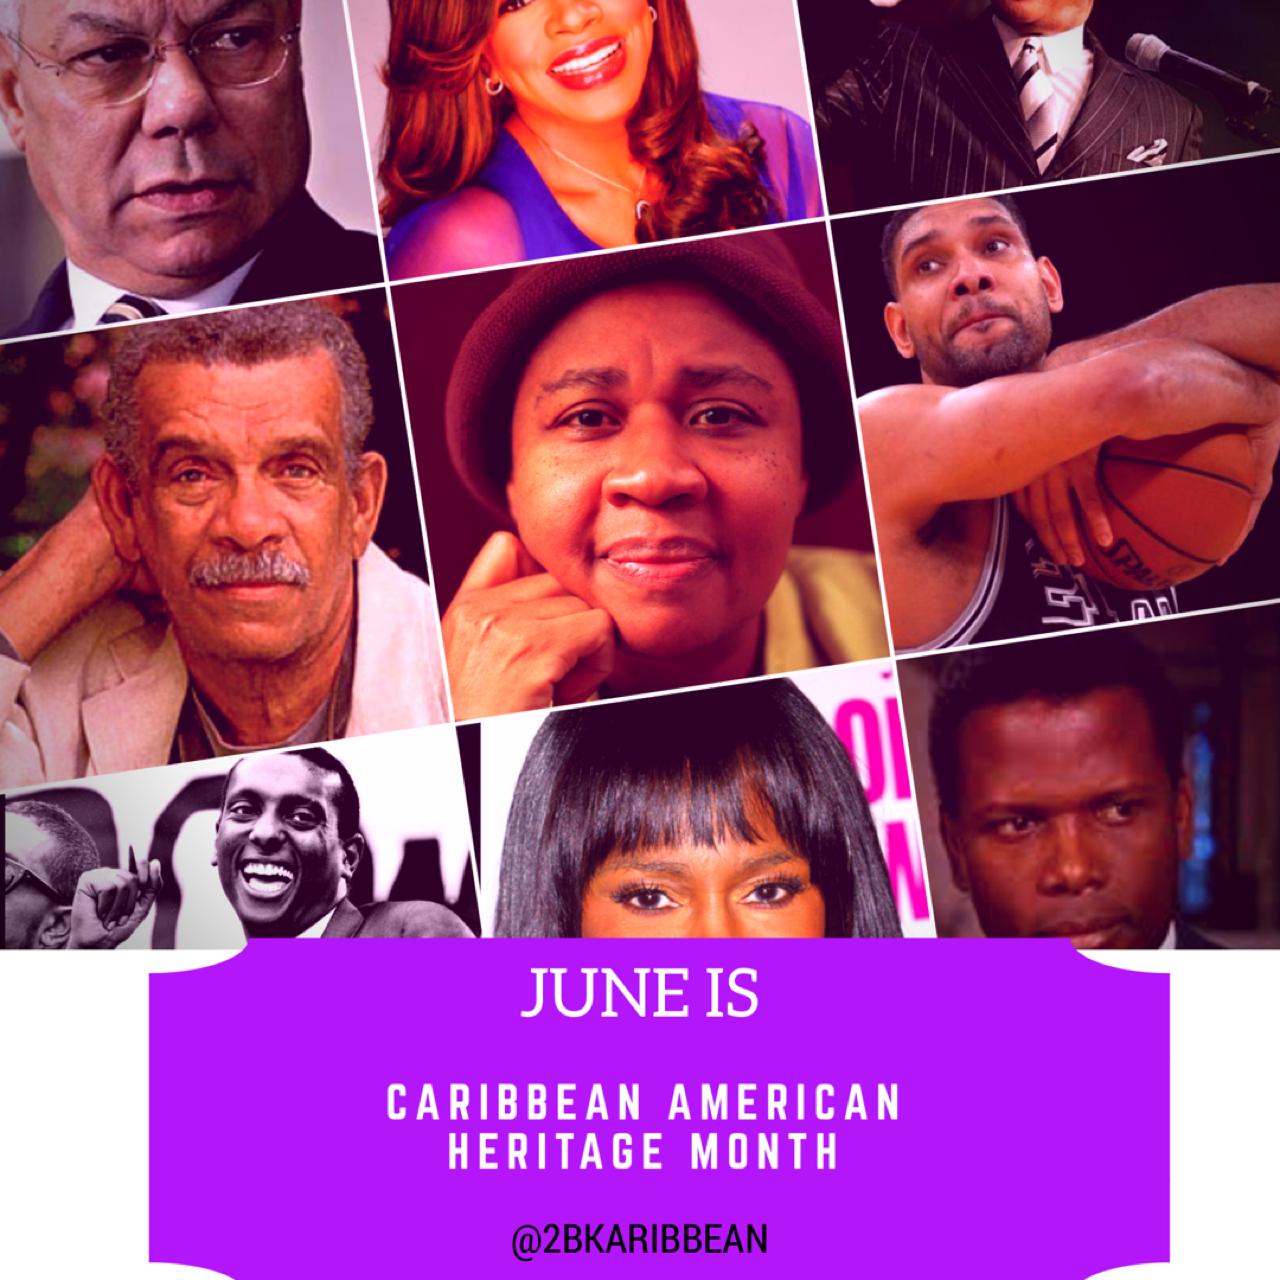 Caribbean American Heritage Month and 2BKaribbean